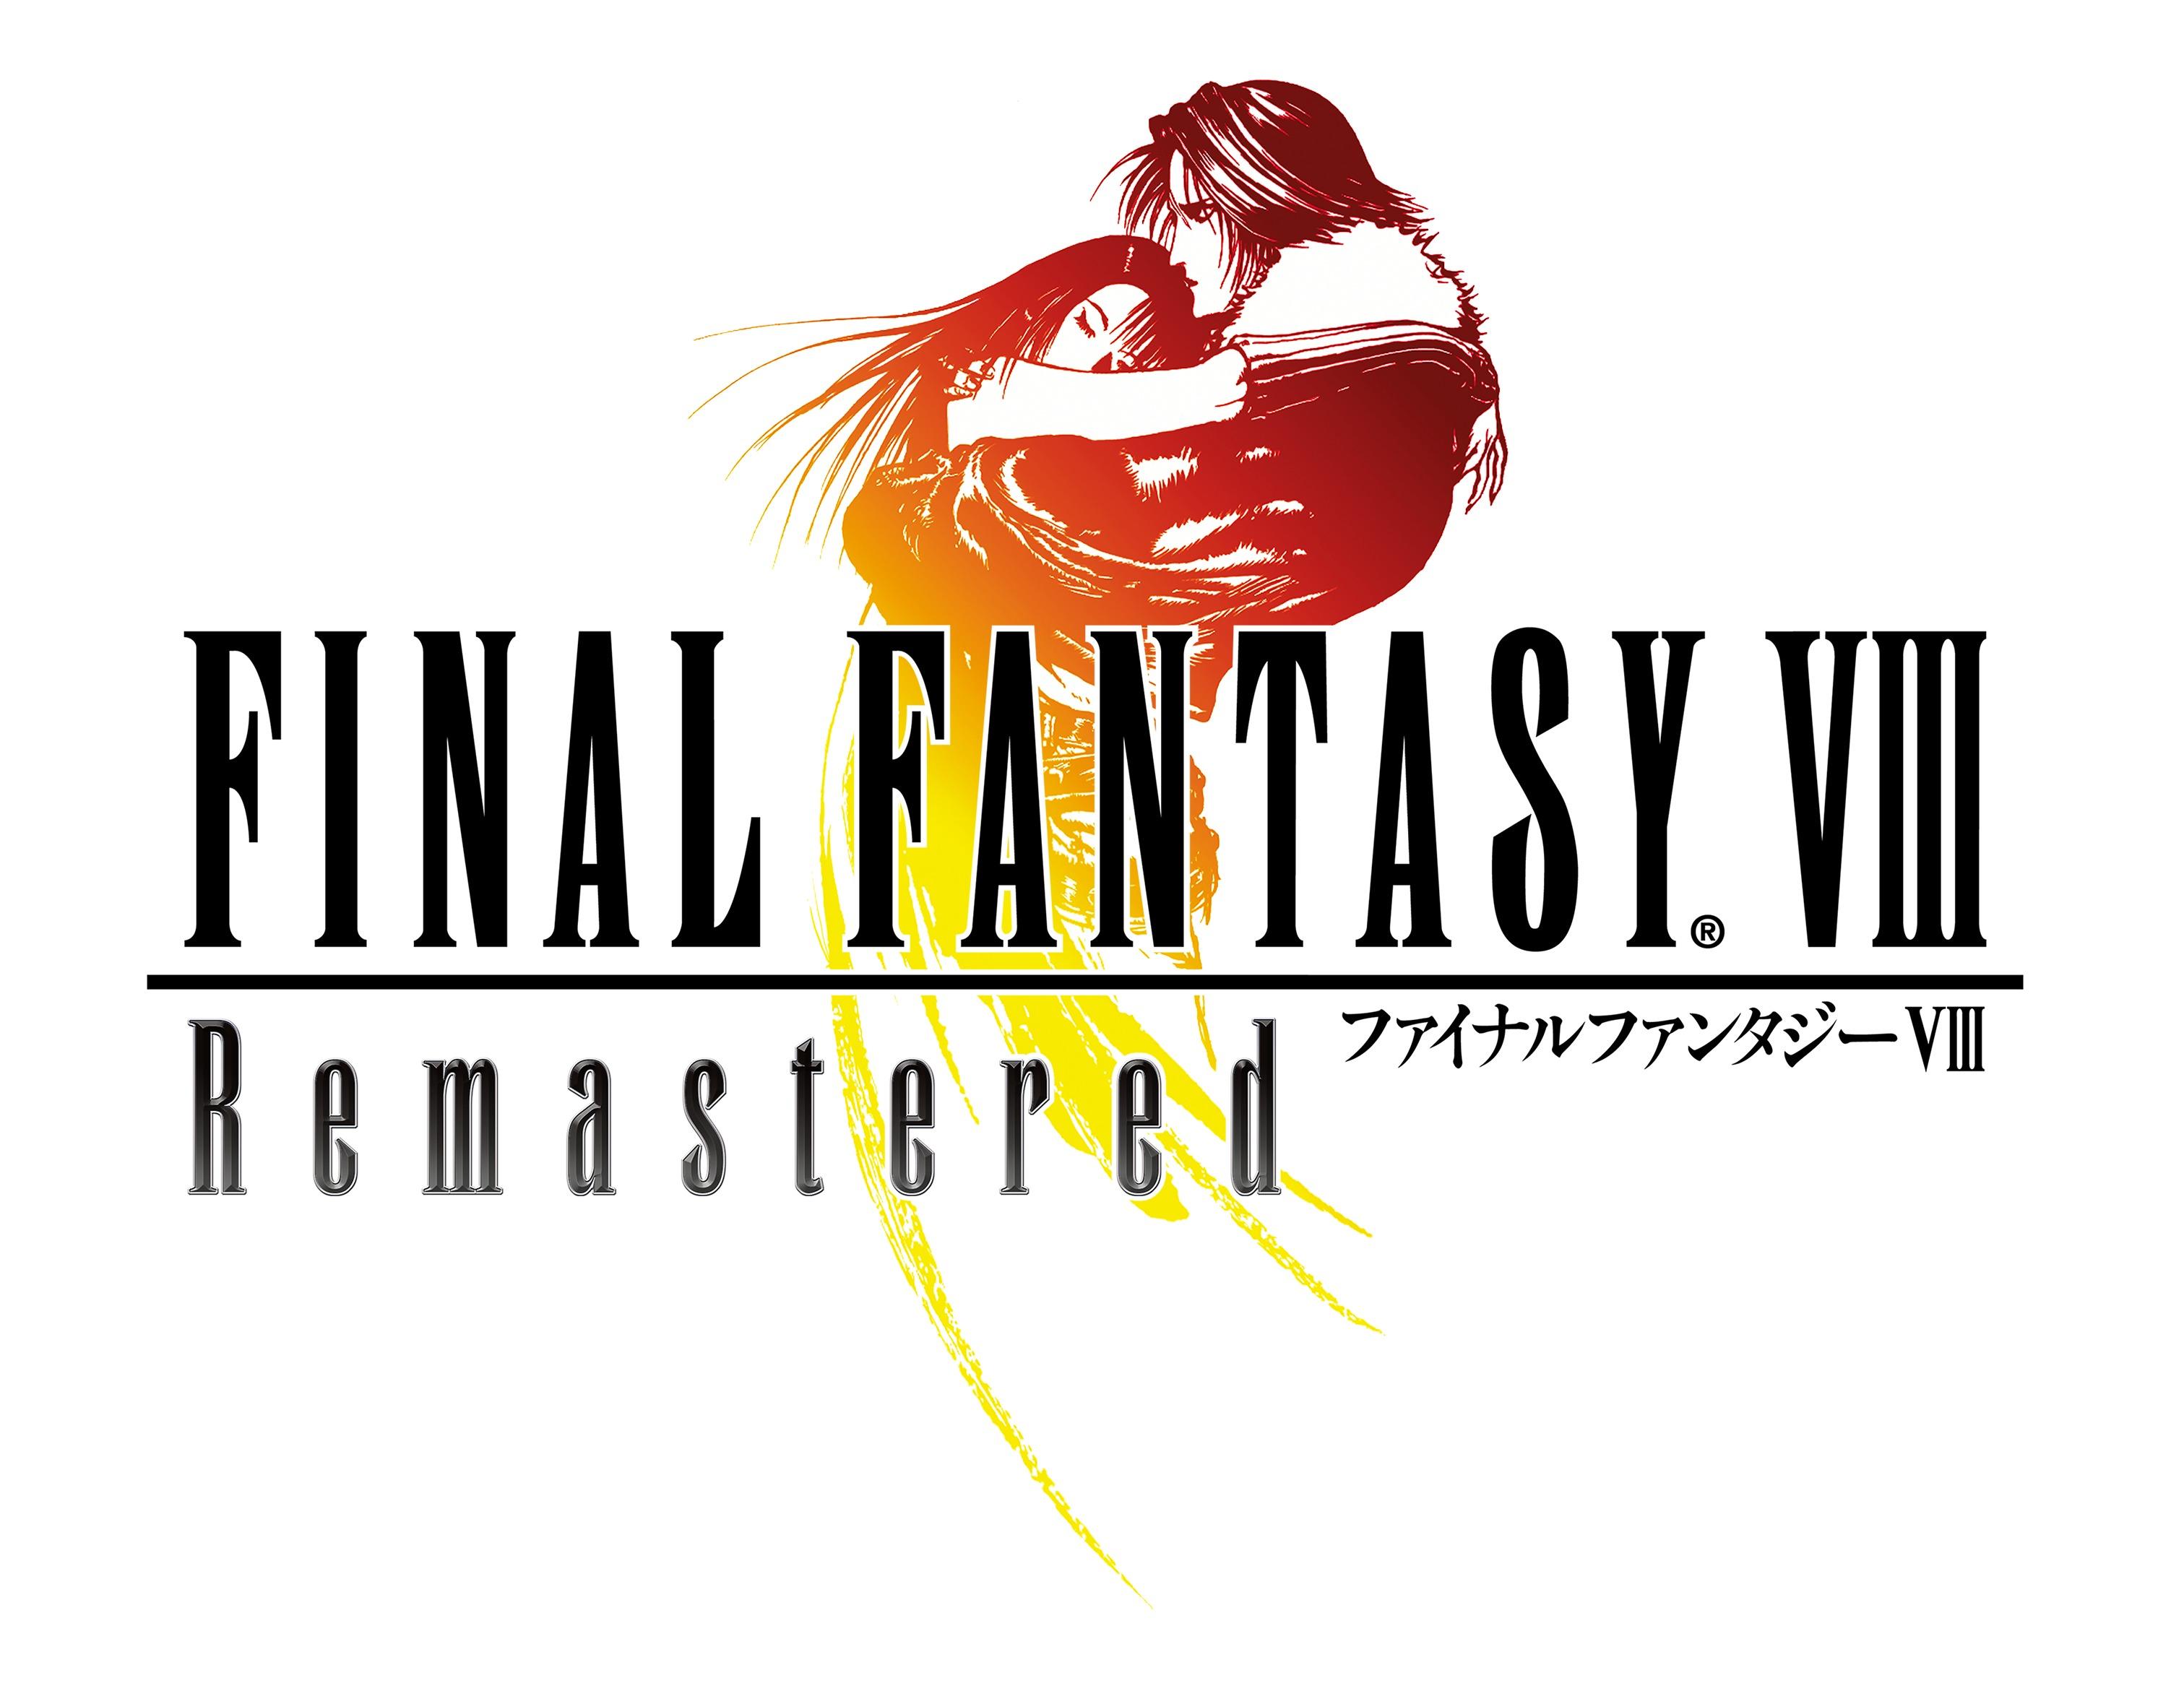 『FINAL FANTASY VIII Remastered』(ファイナルファンタジーVIII リマスタード)ロゴ